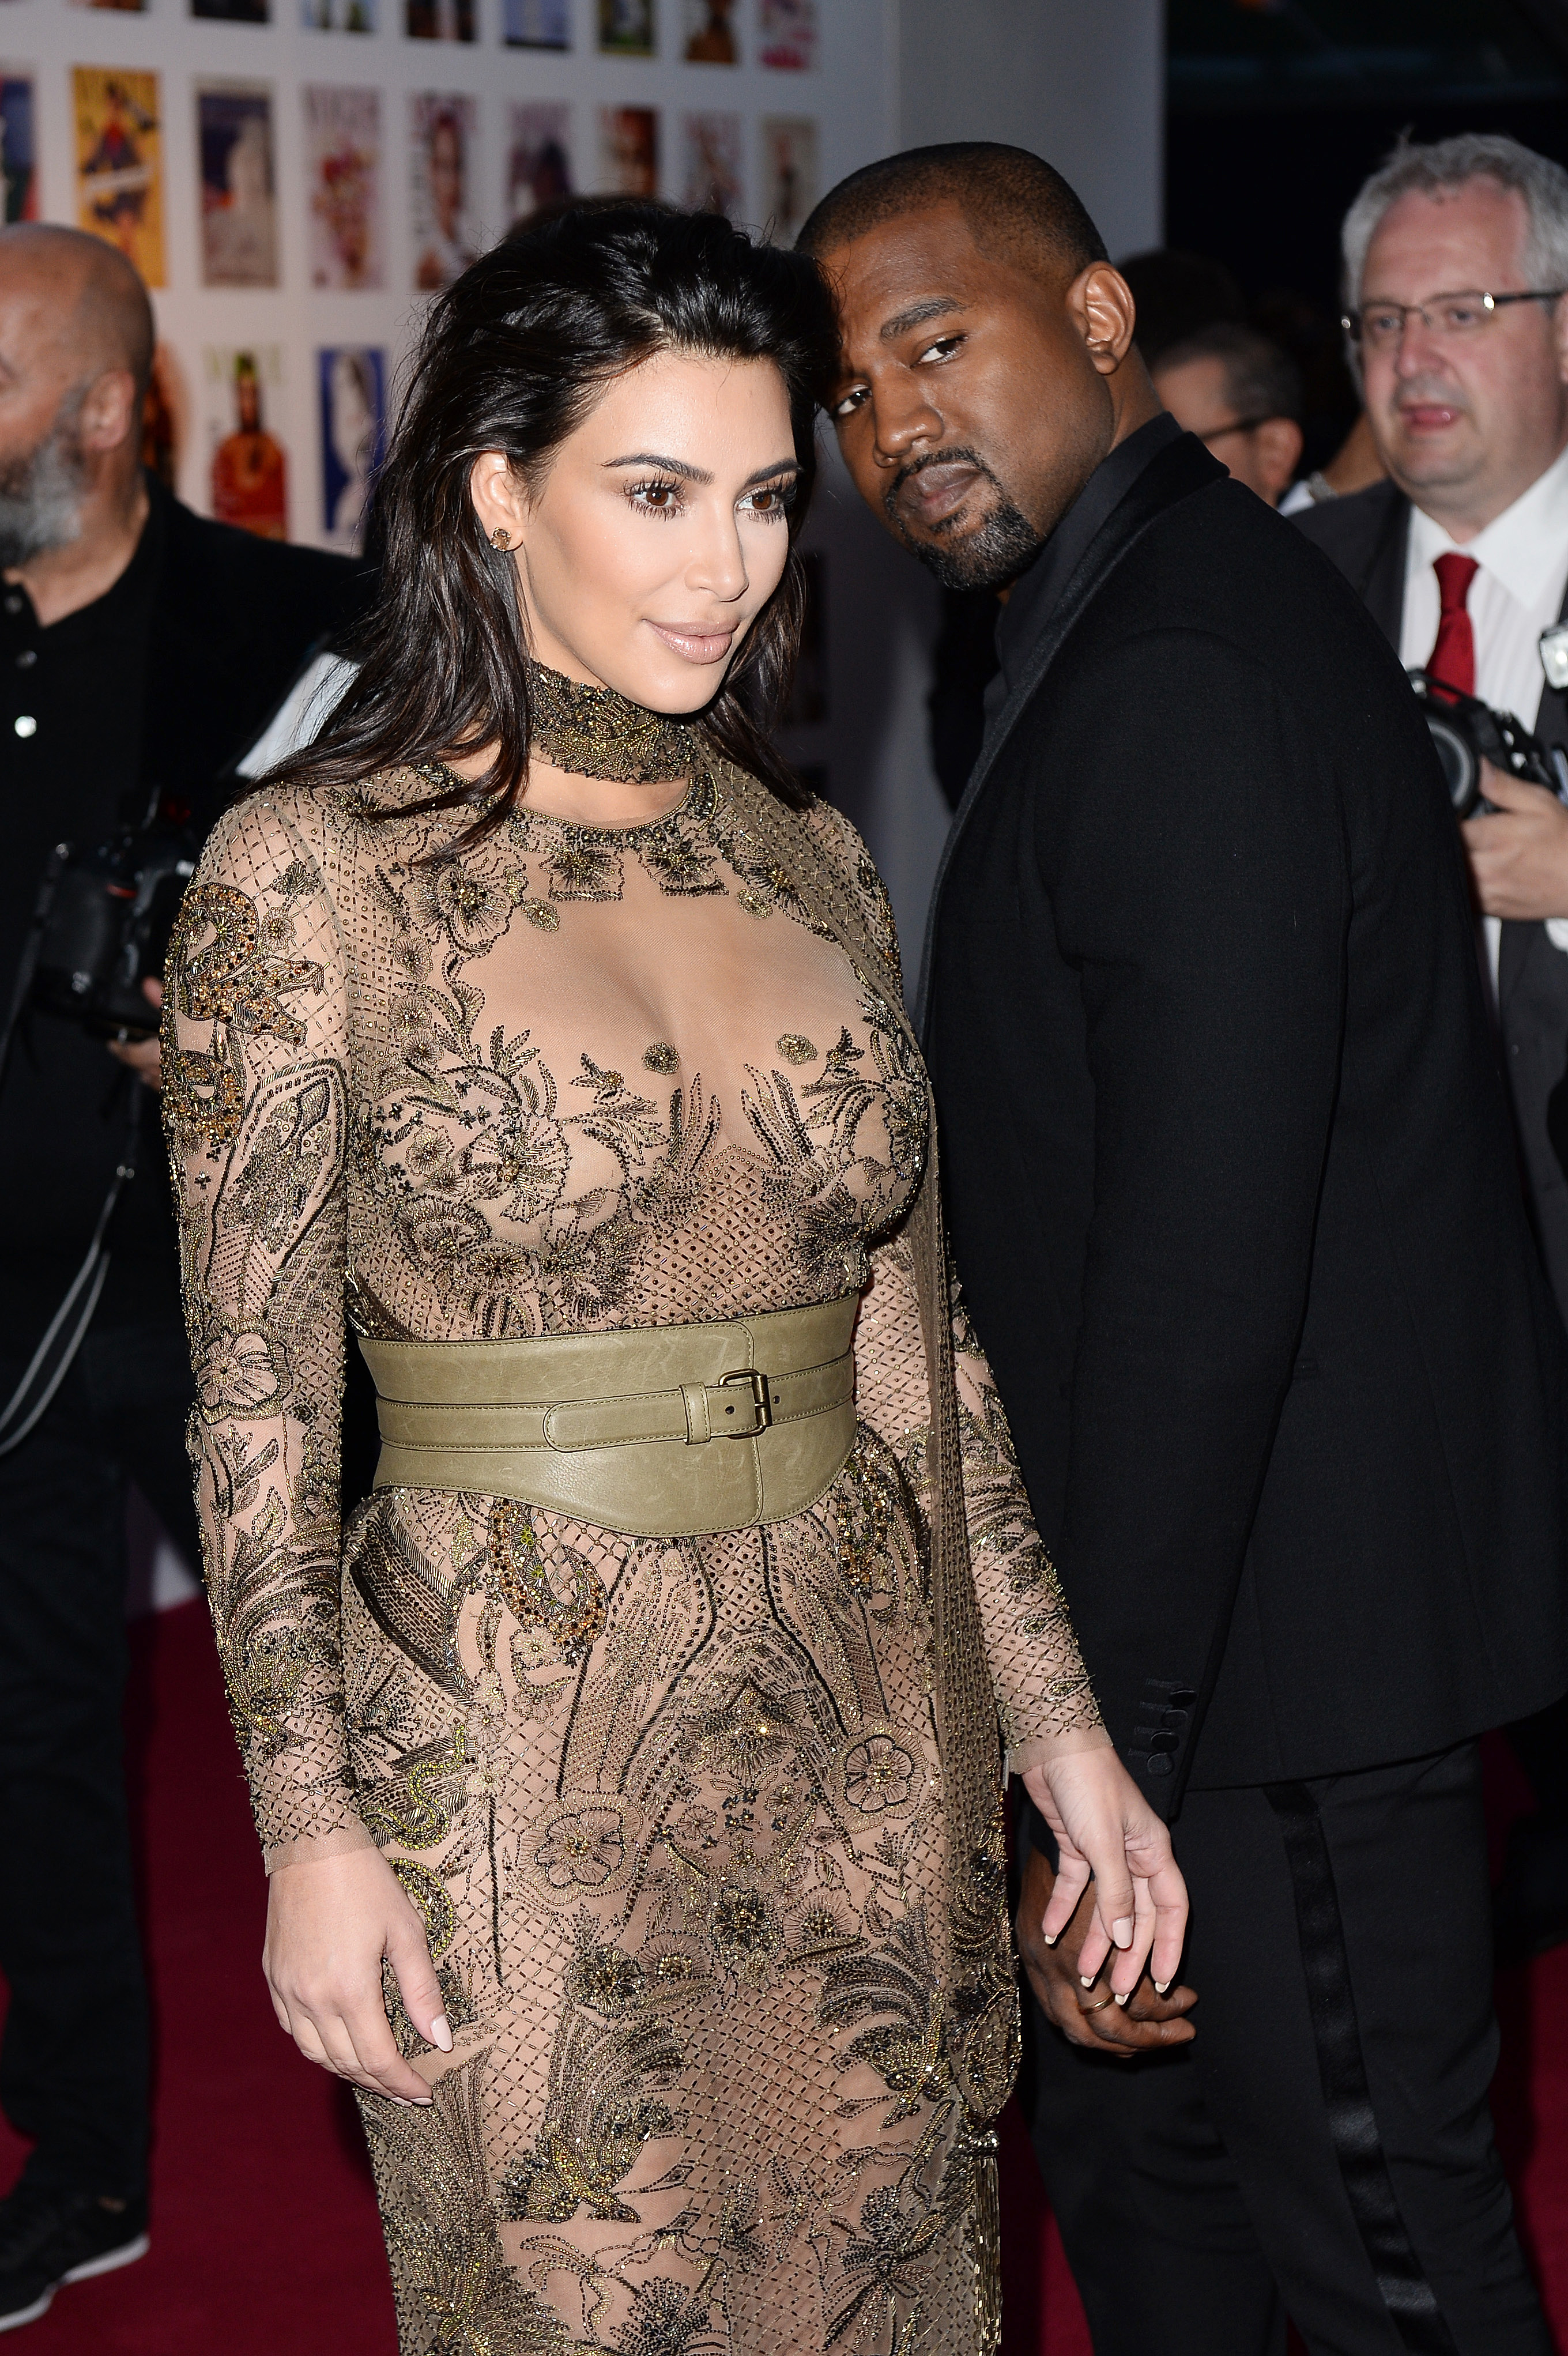 Kim Kardashian & Kanye West at Vogue 100 Festival